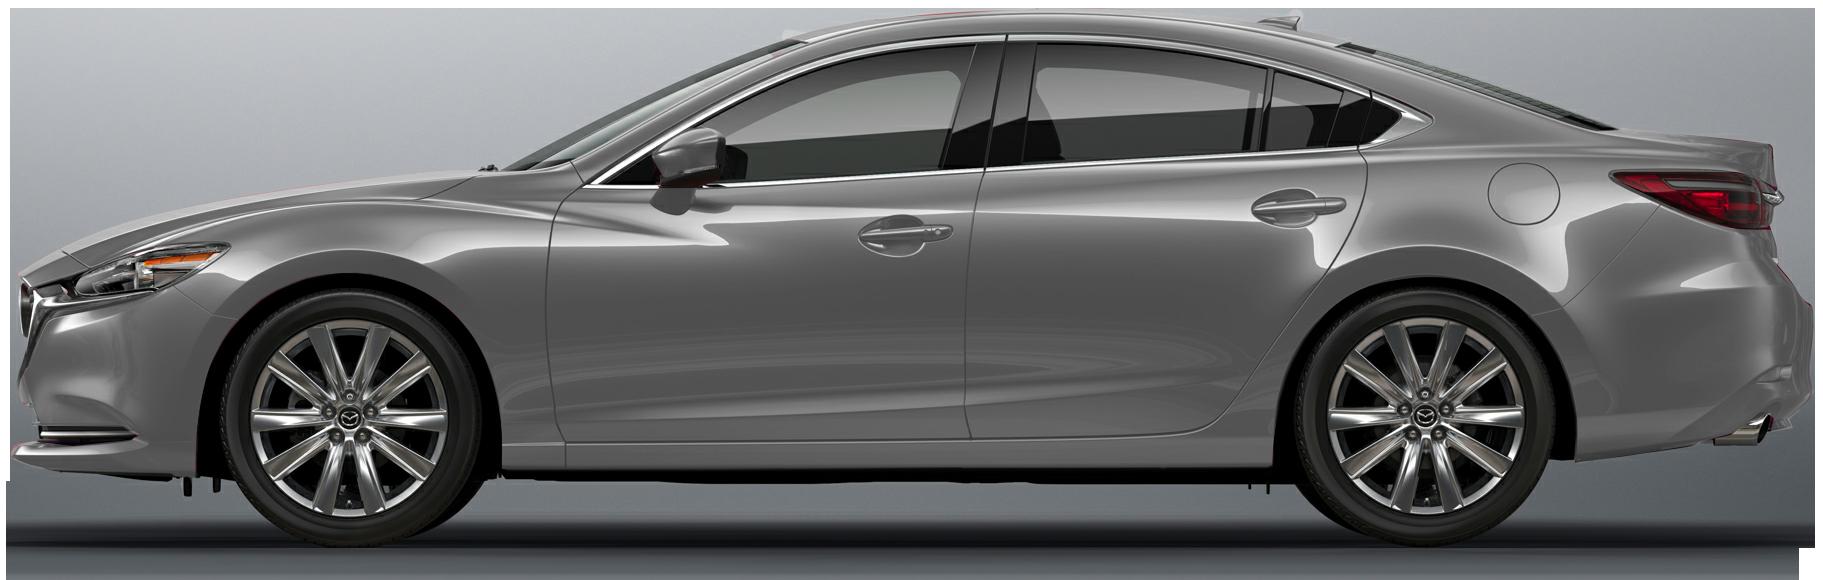 2019 Mazda Mazda6 Sedan Touring